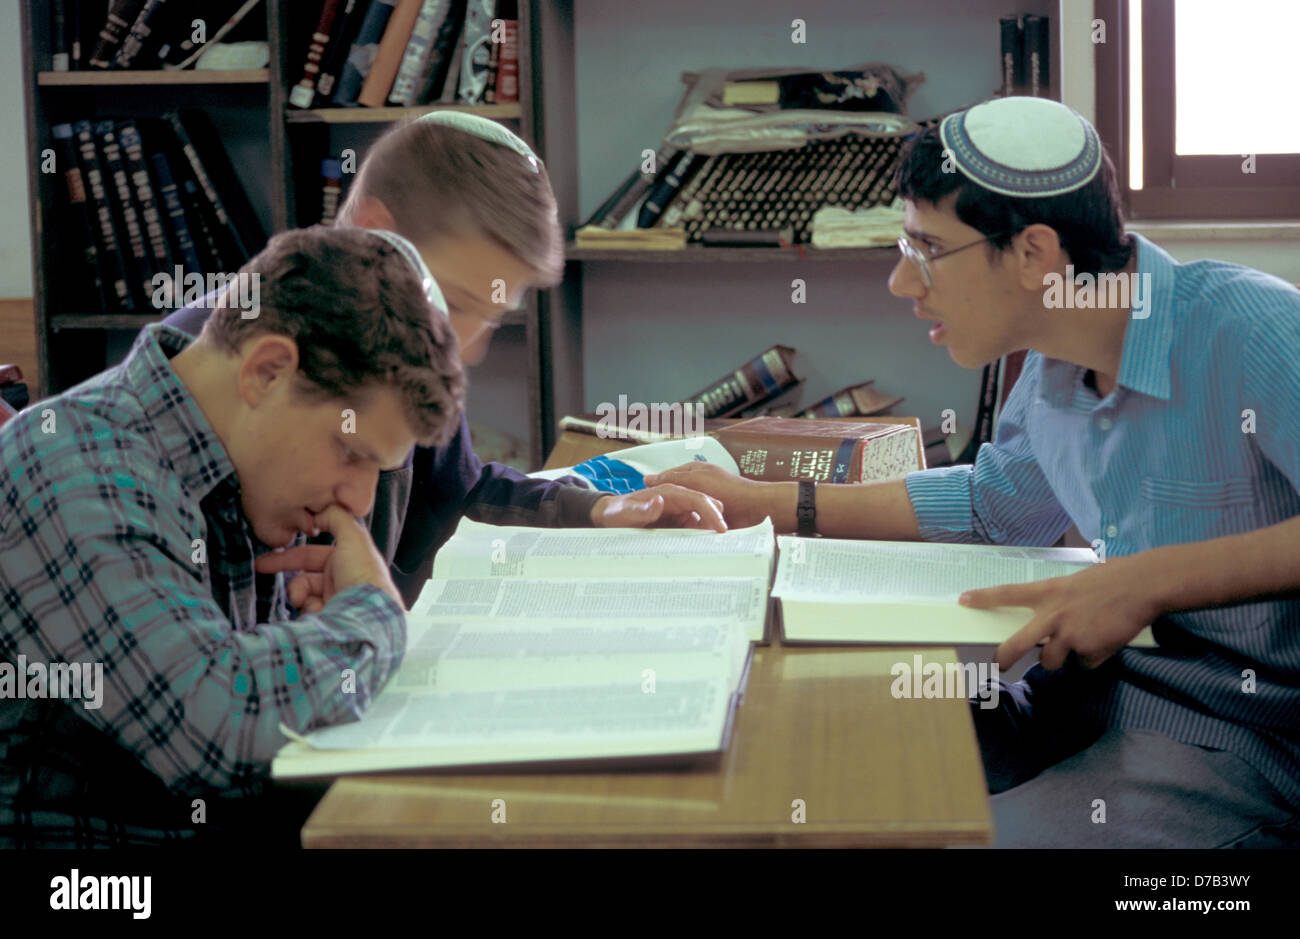 yeshiva students in efrat, gush etzion - Stock Image